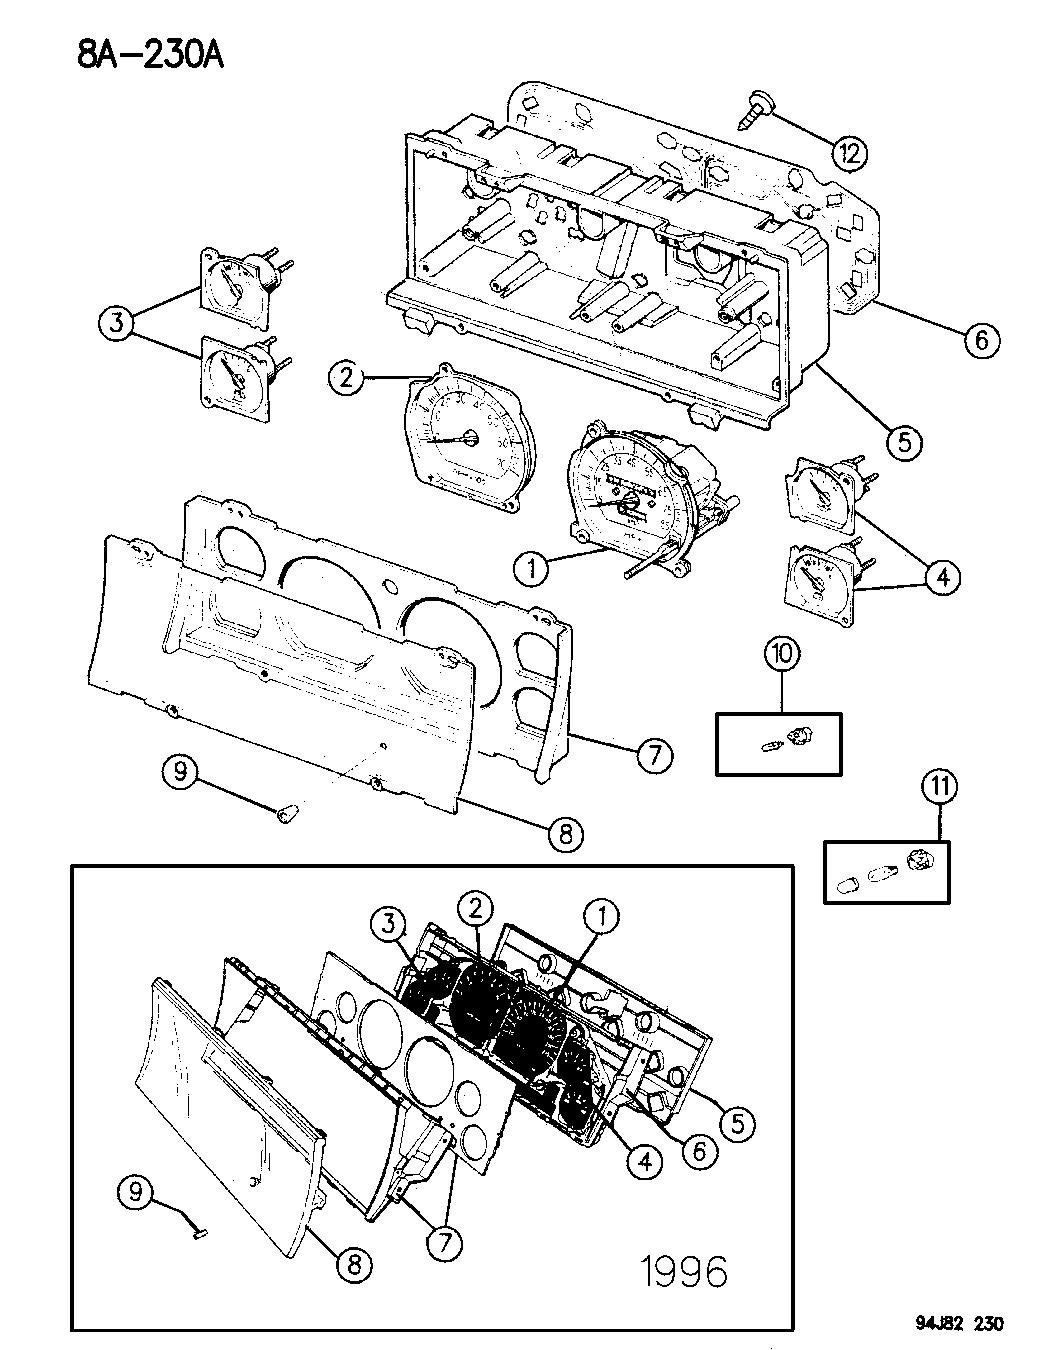 1994 Jeep Grand Cherokee Instrument Cluster - Mopar Parts ...